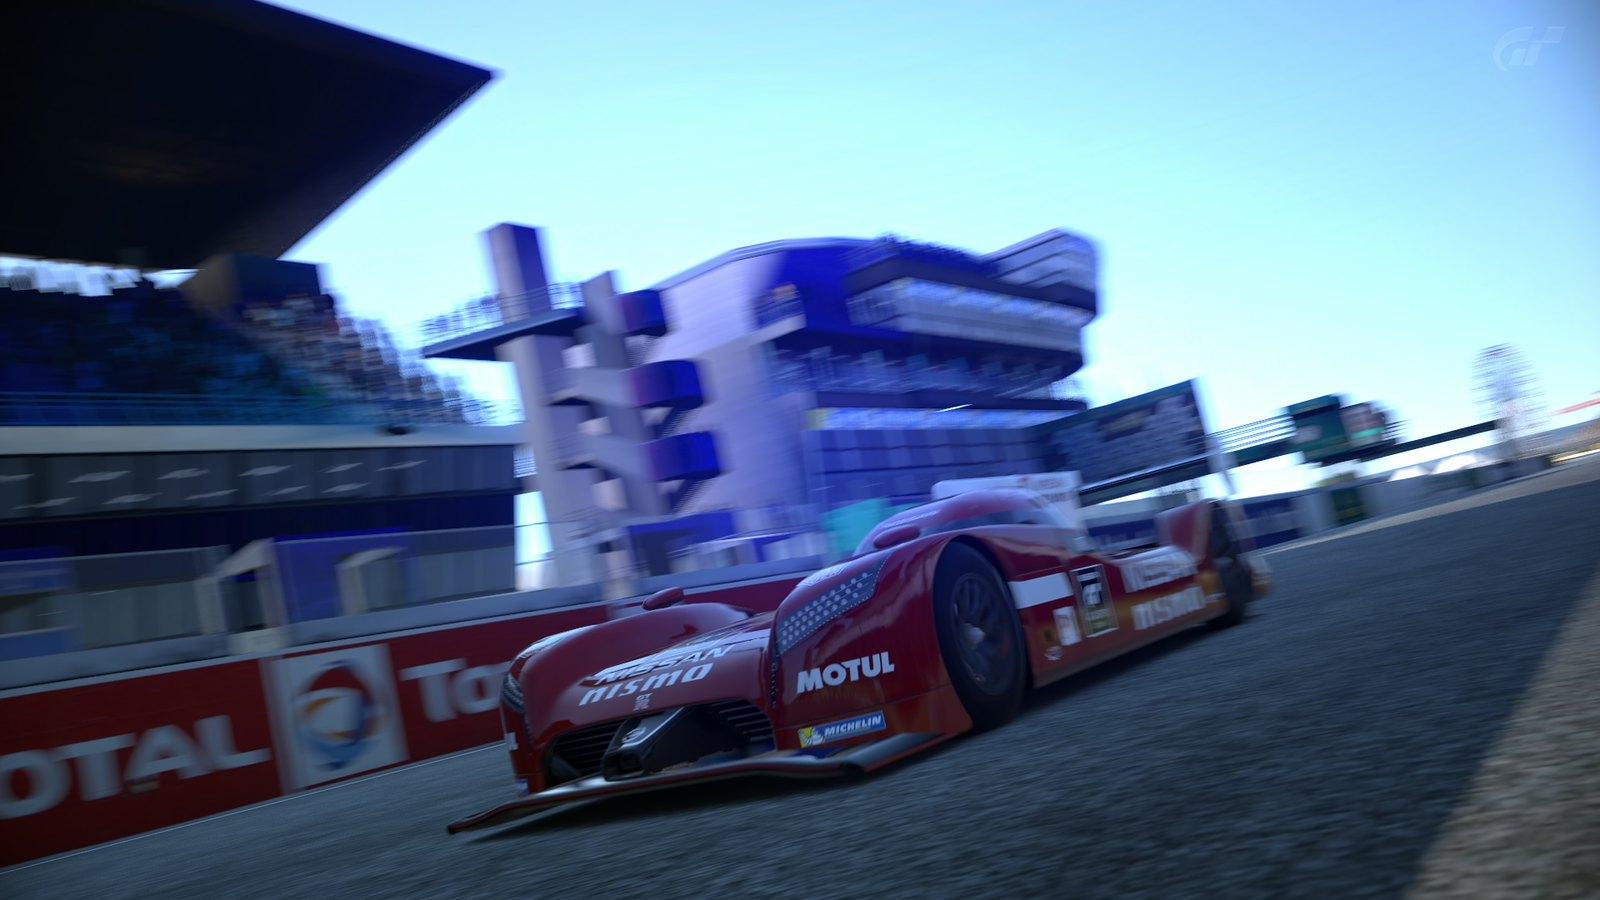 Circuit de la Sarthe 2013